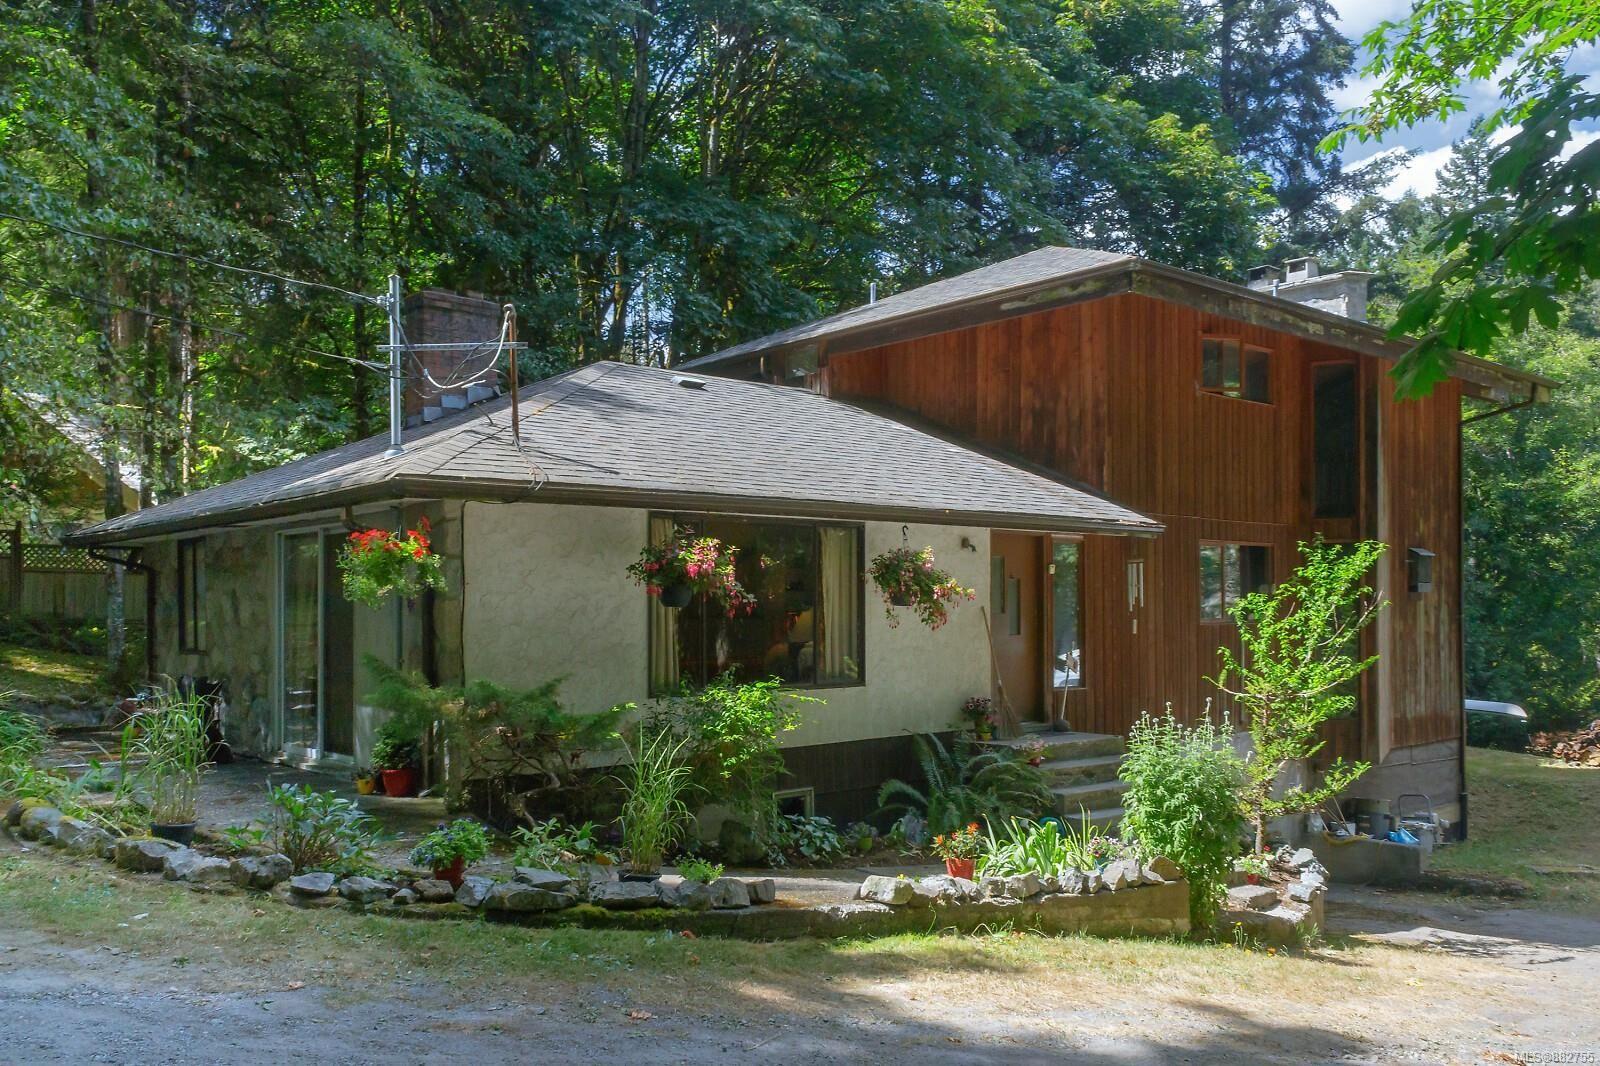 Main Photo: 398 Goward Rd in : SW Prospect Lake House for sale (Saanich West)  : MLS®# 882755